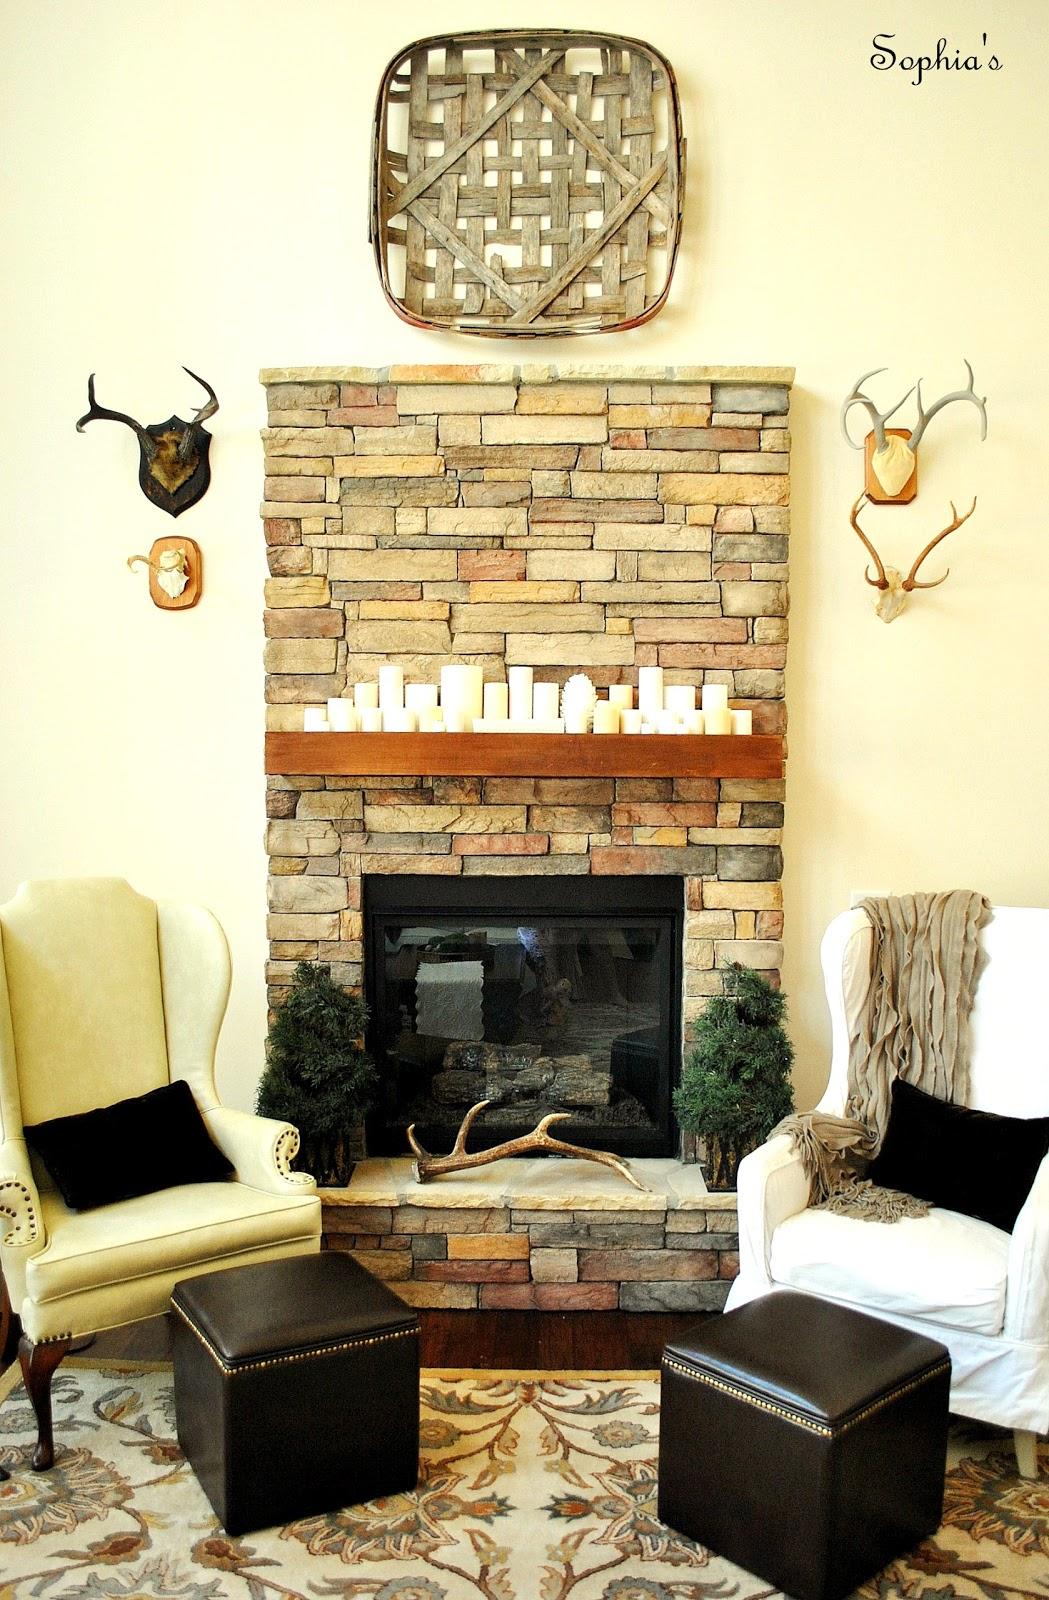 Sophia's: A Cozy Rustic Fireplace